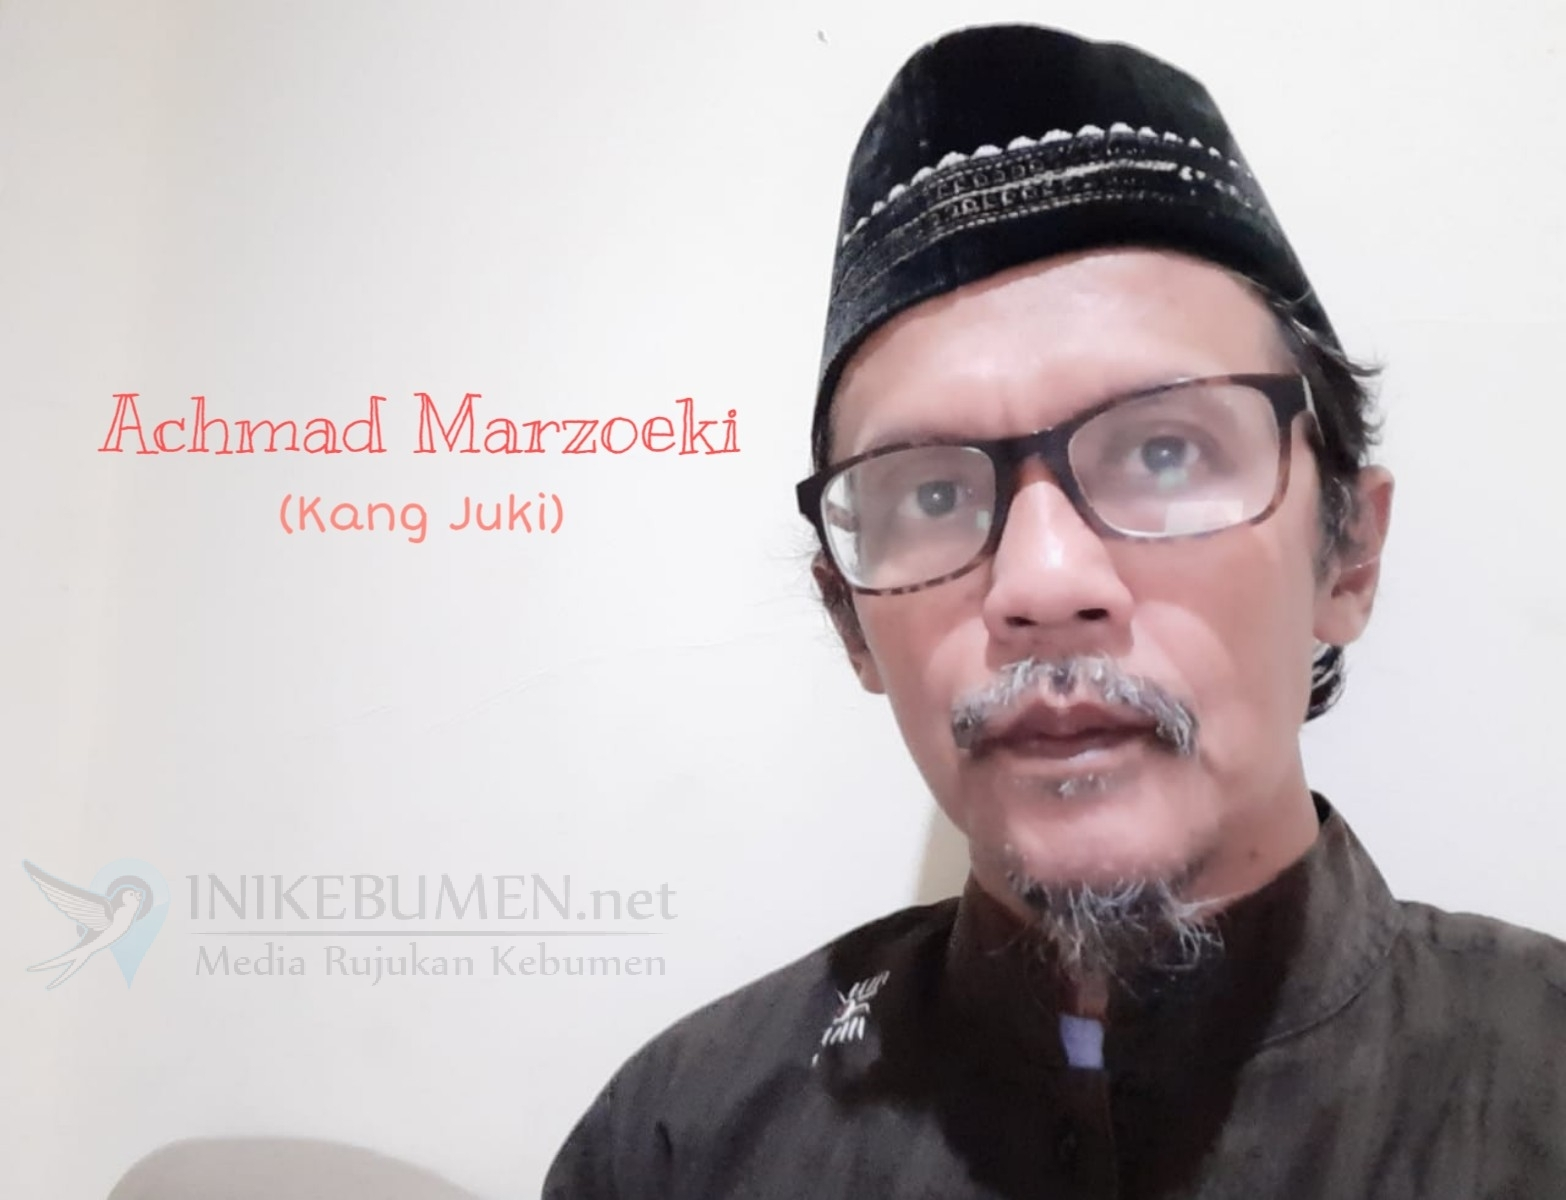 Ramadhan Berakhir, Ramadhan Terakhir